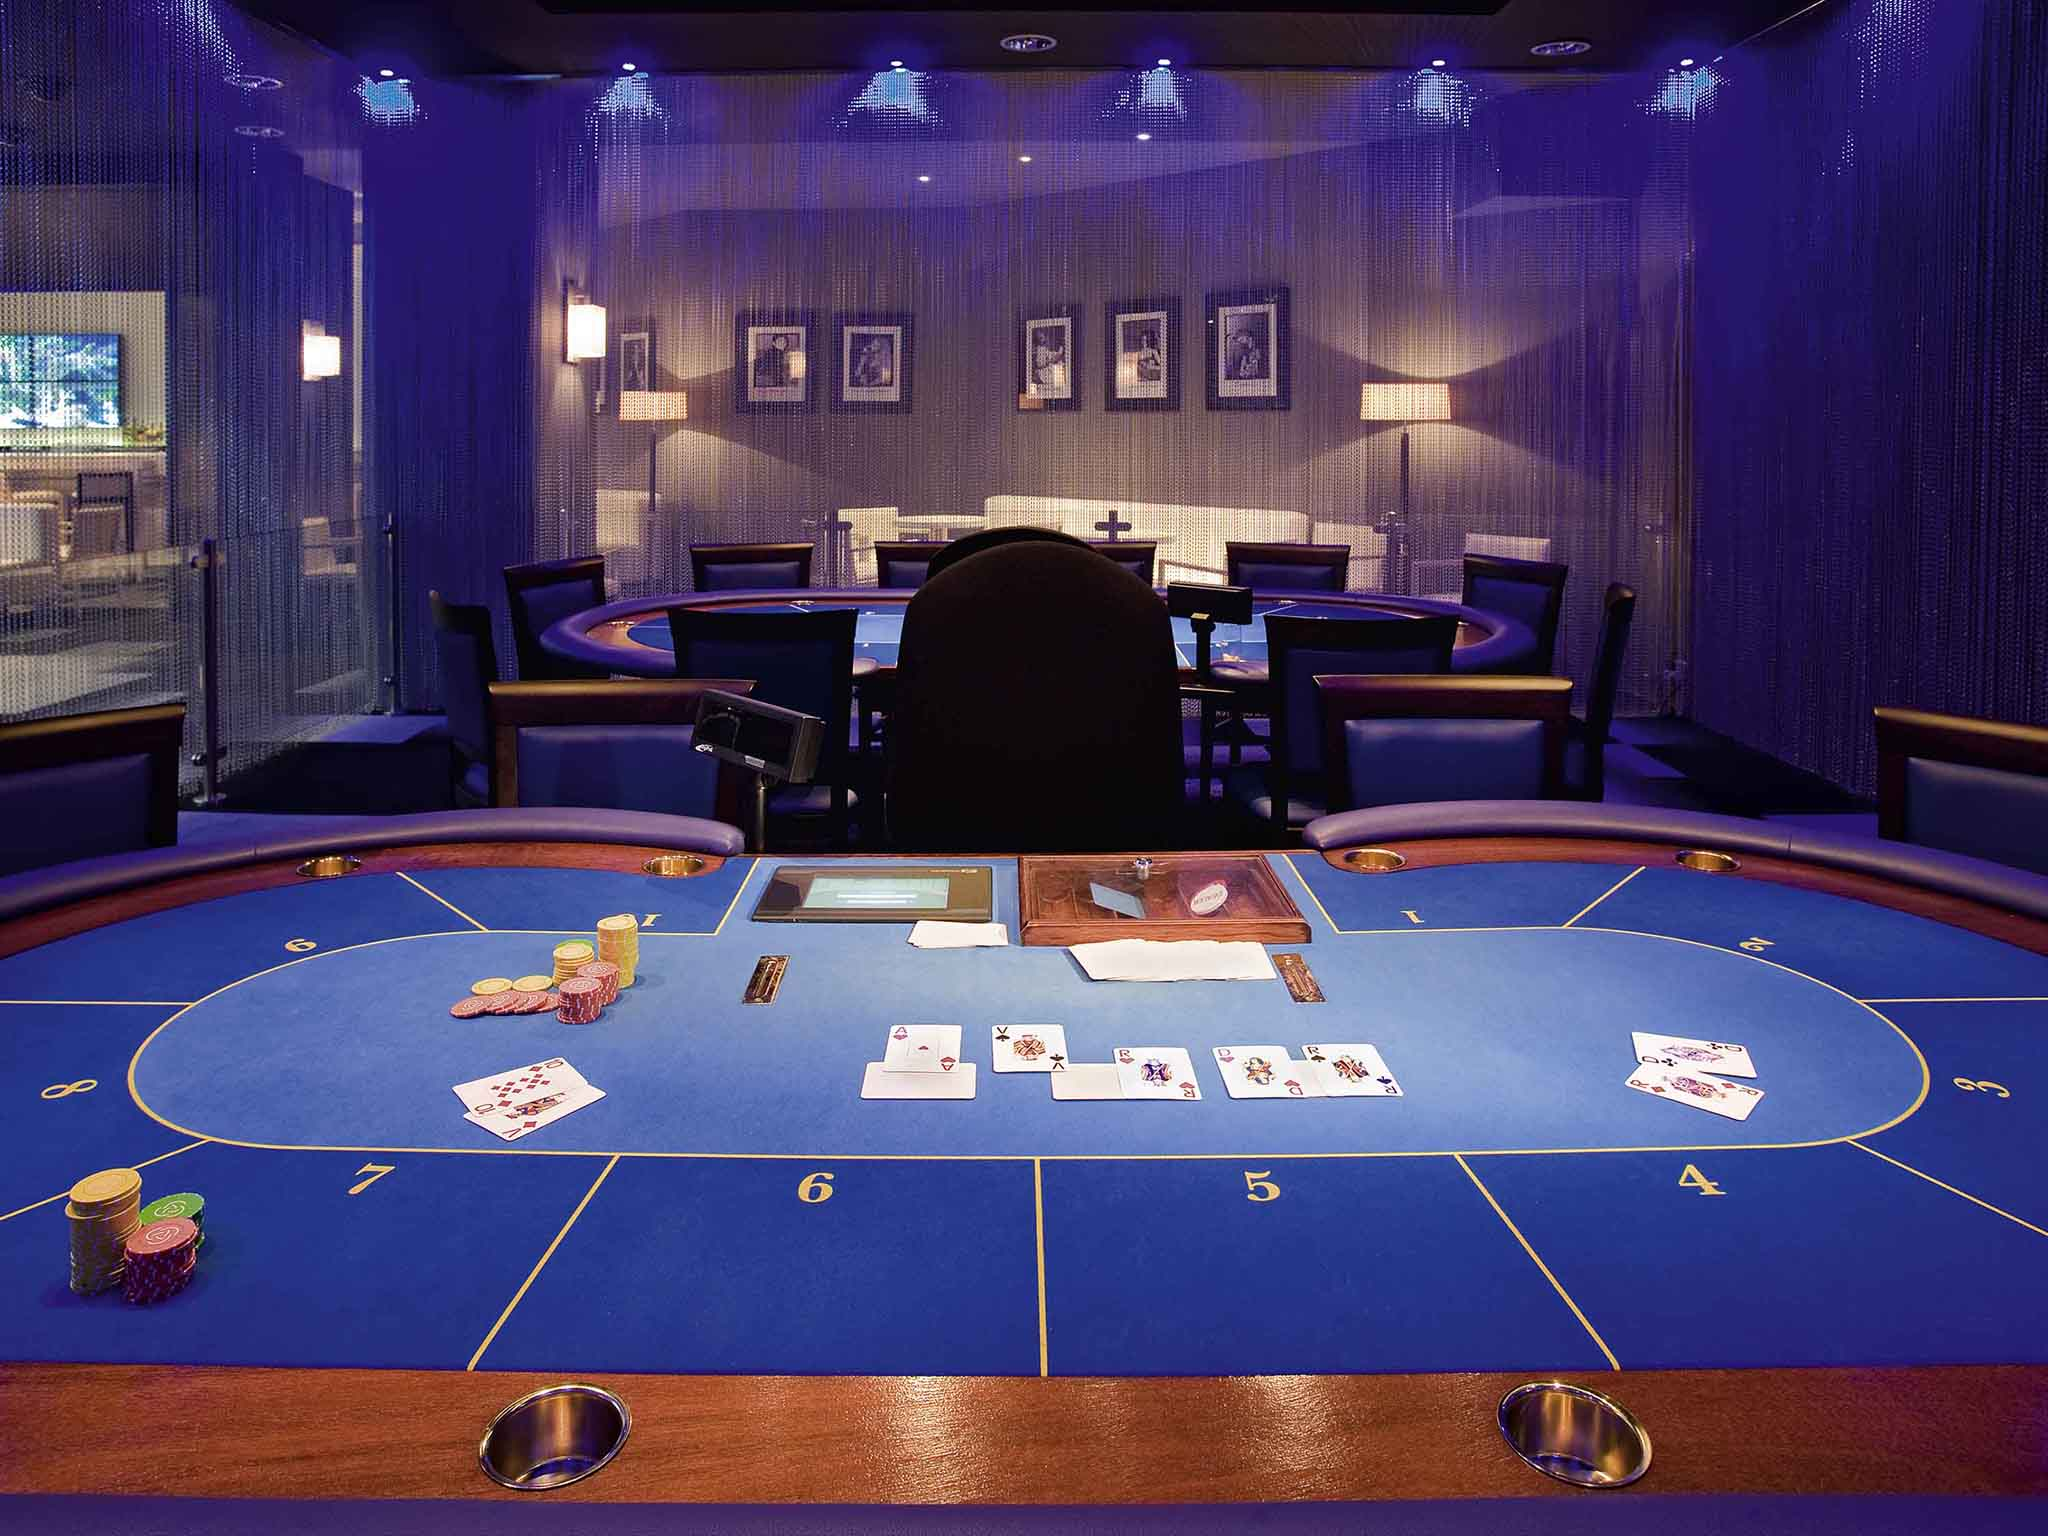 Casino cannes mandelieu poker las vegas casino pc game